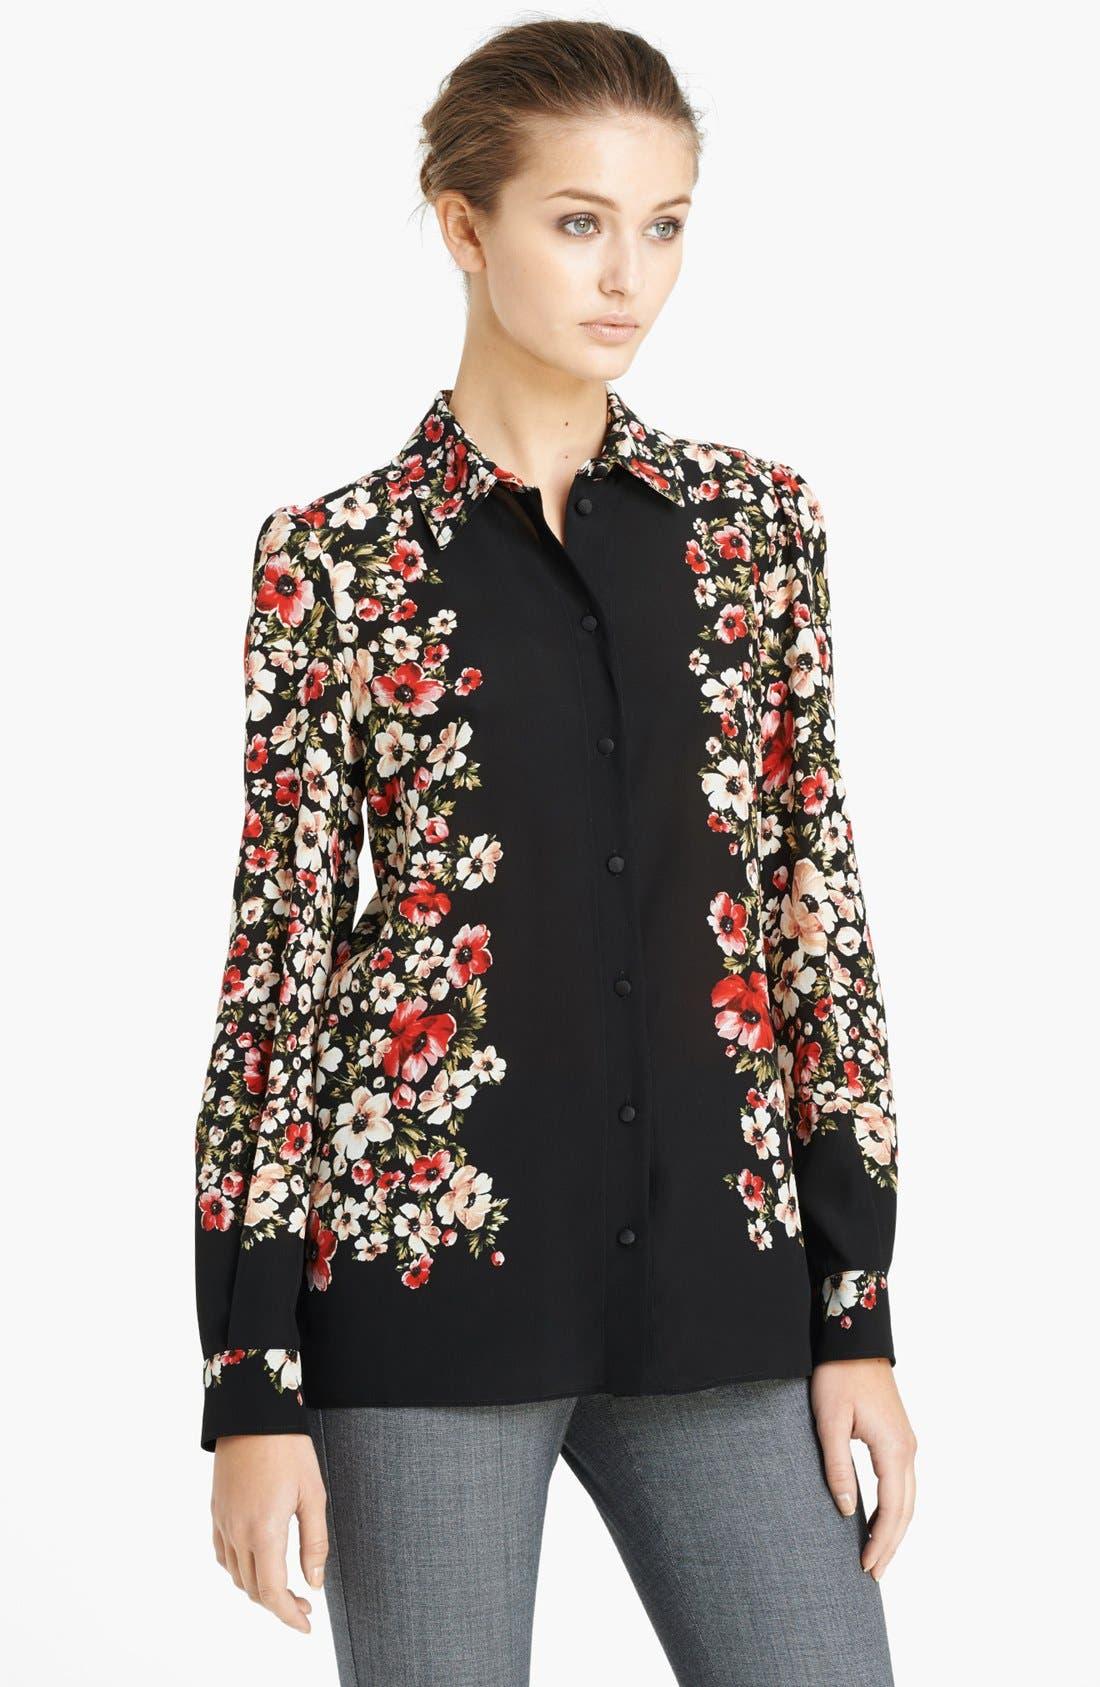 Alternate Image 1 Selected - Dolce&Gabbana Floral Print Blouse